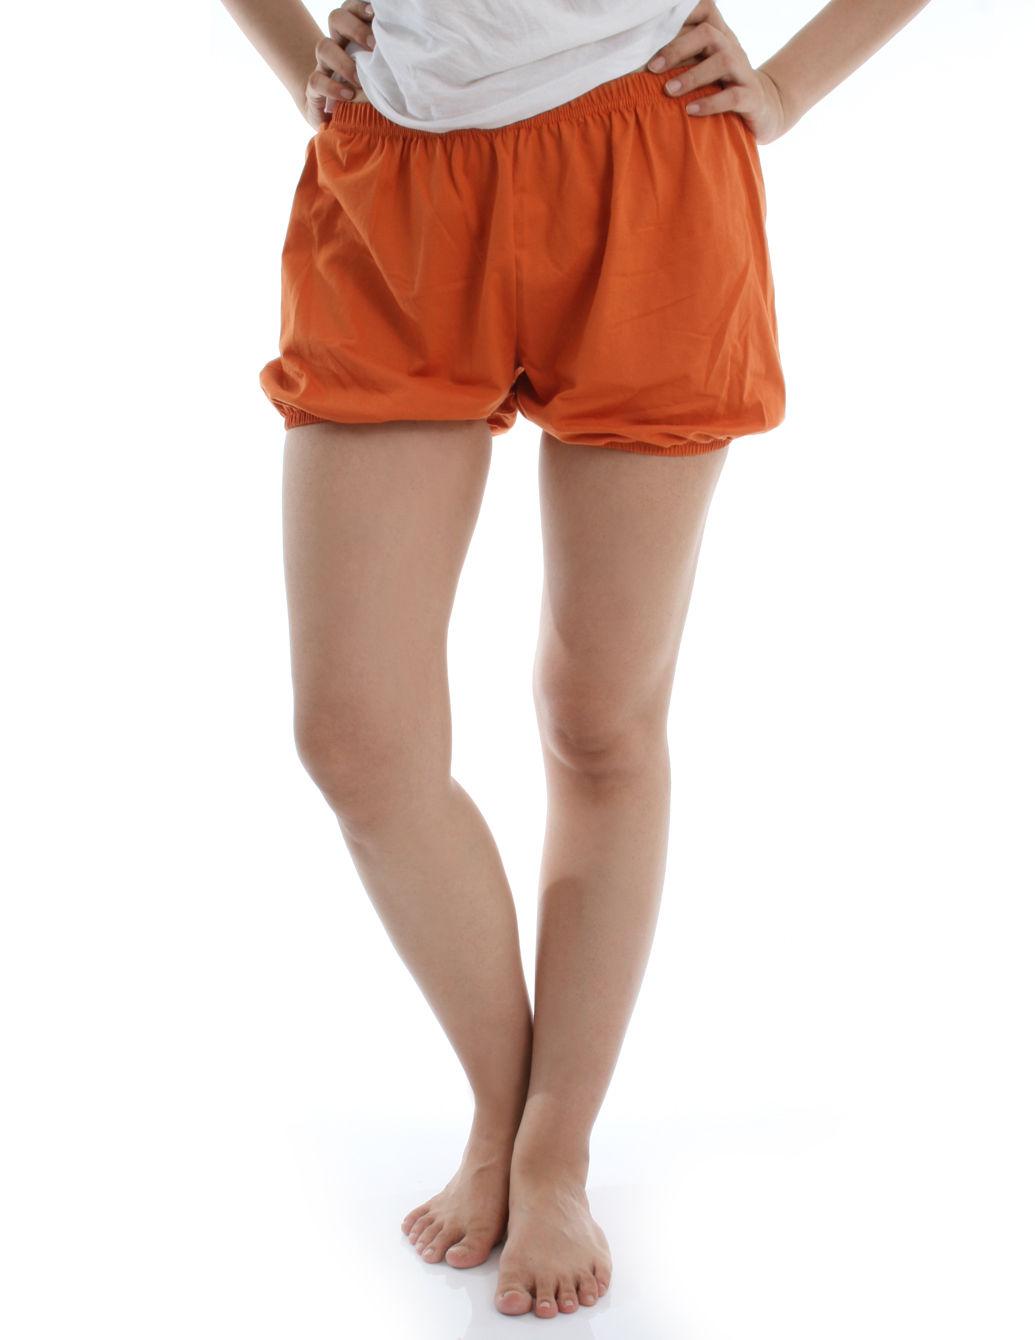 RTBU瑜珈褲~燈籠褲造型。橘色